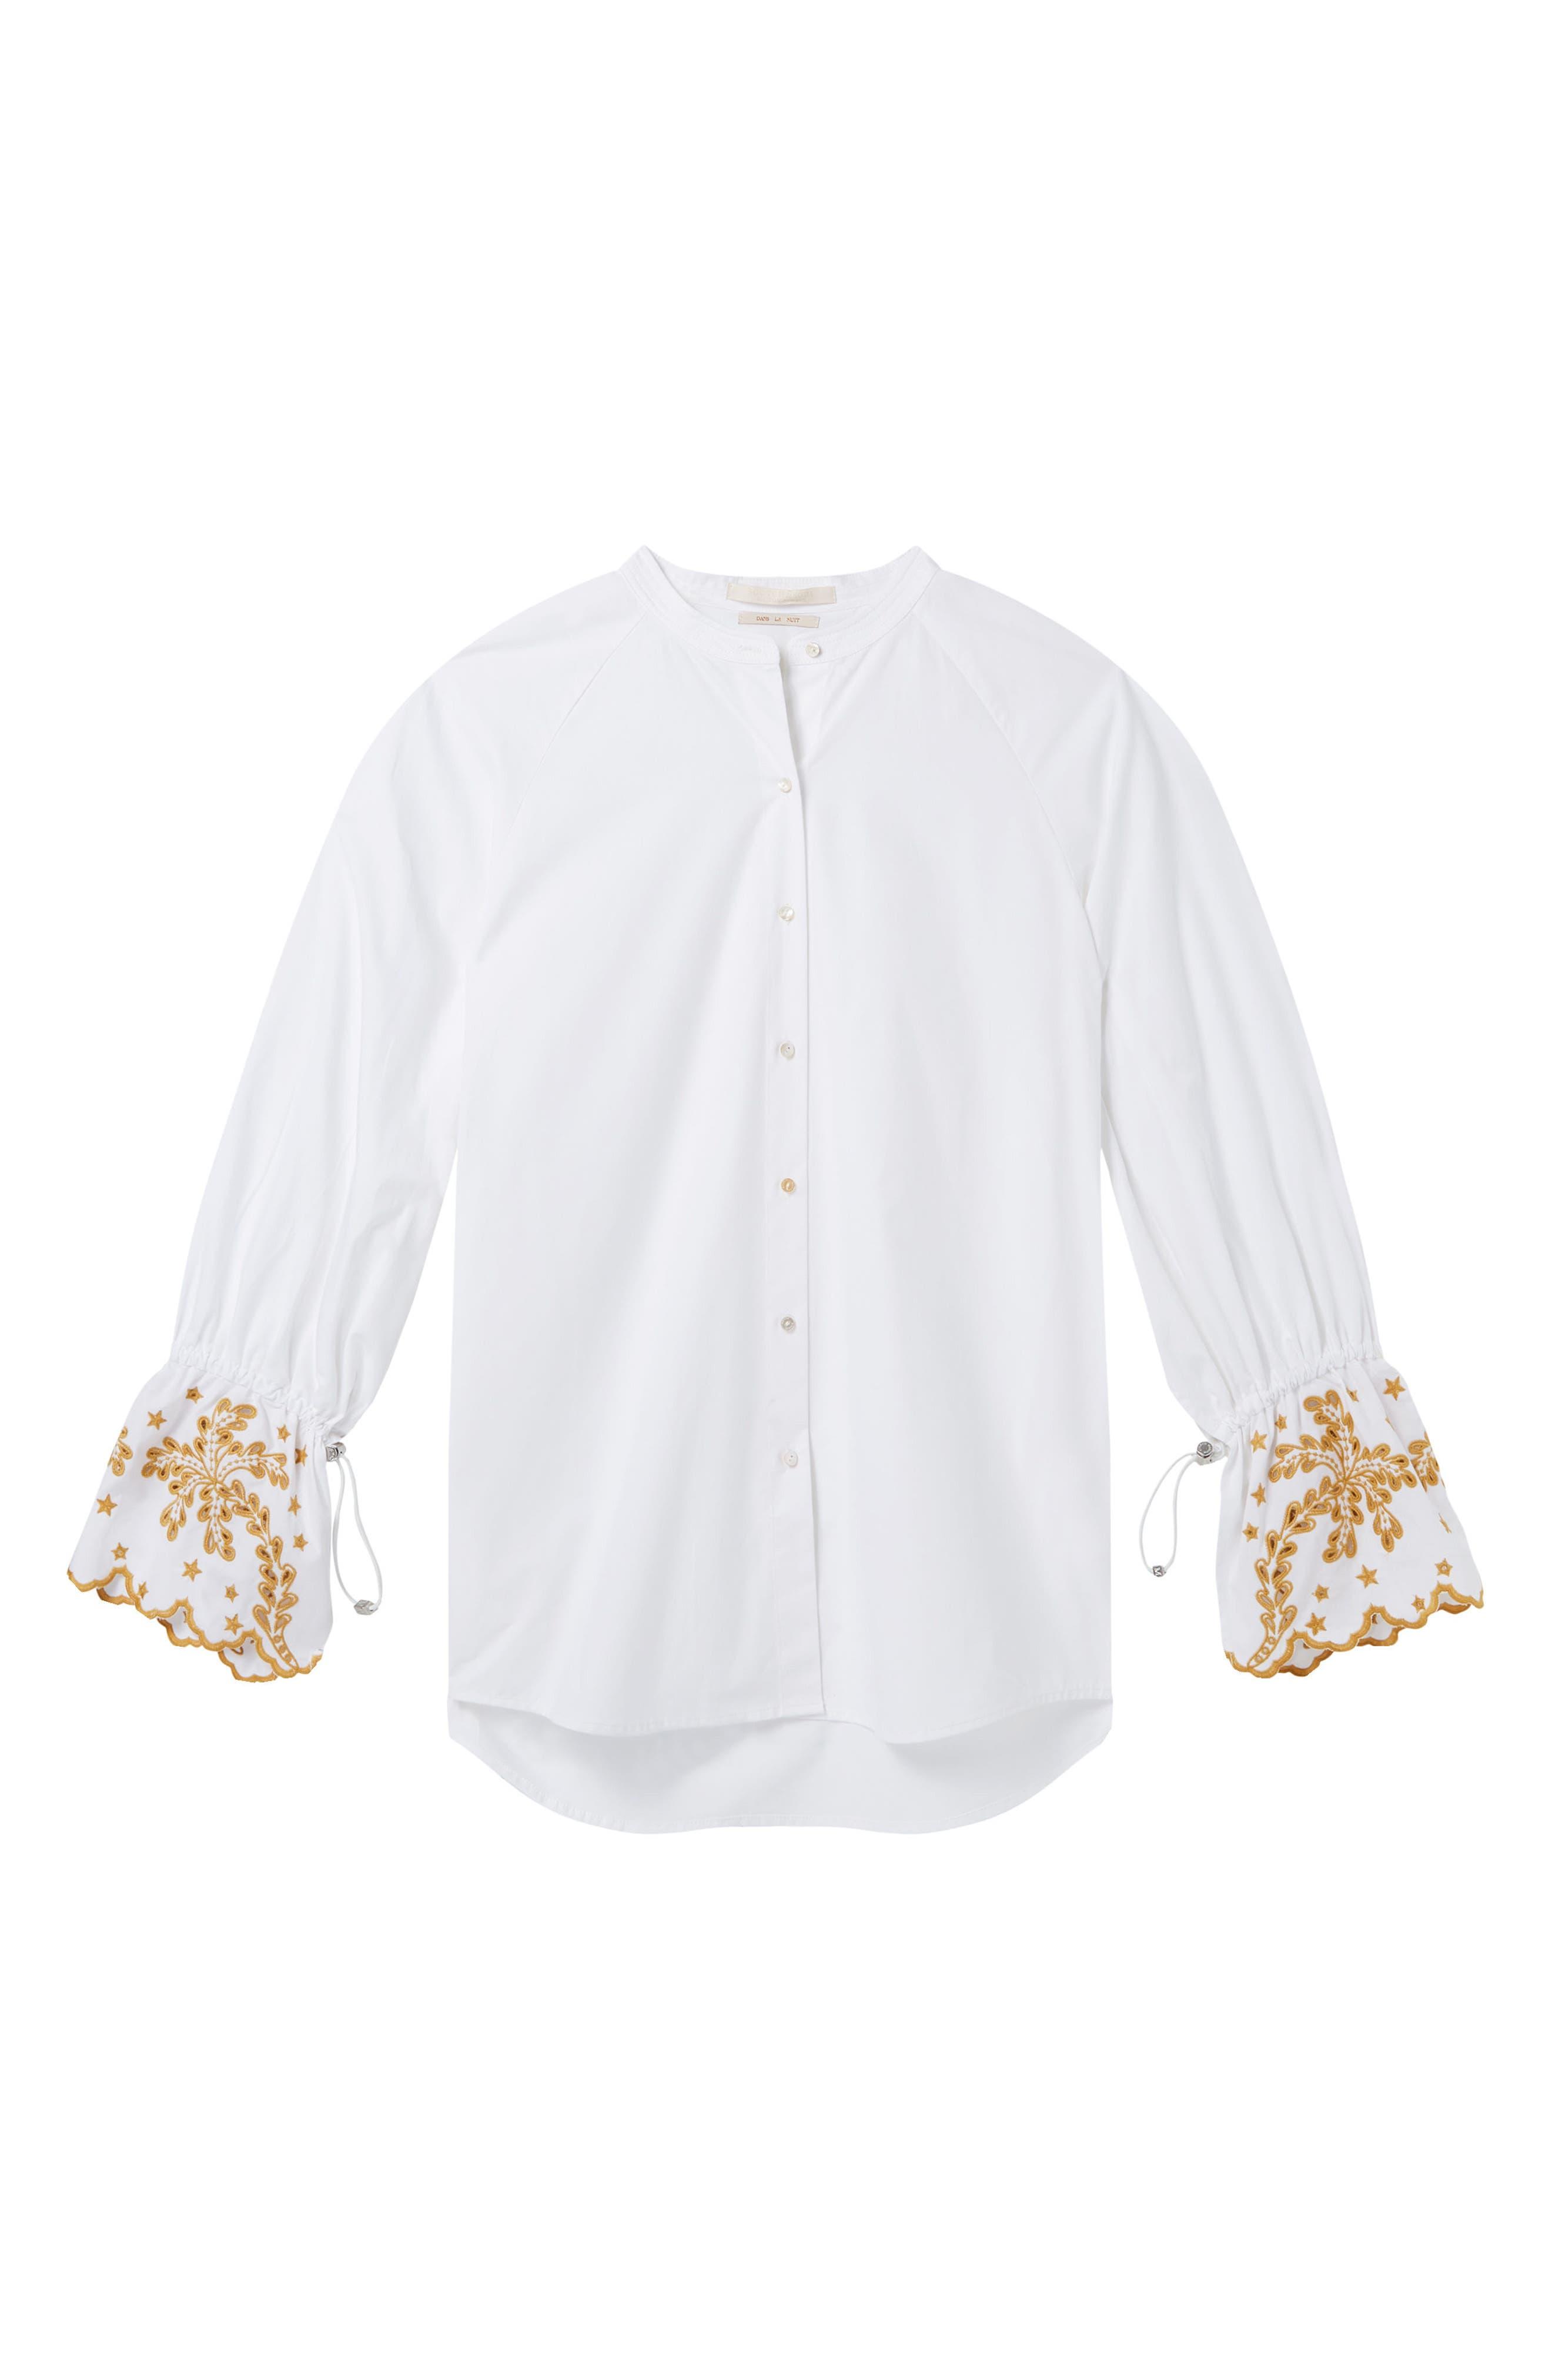 Oversize Button Front Shirt,                             Alternate thumbnail 8, color,                             Color 06 White